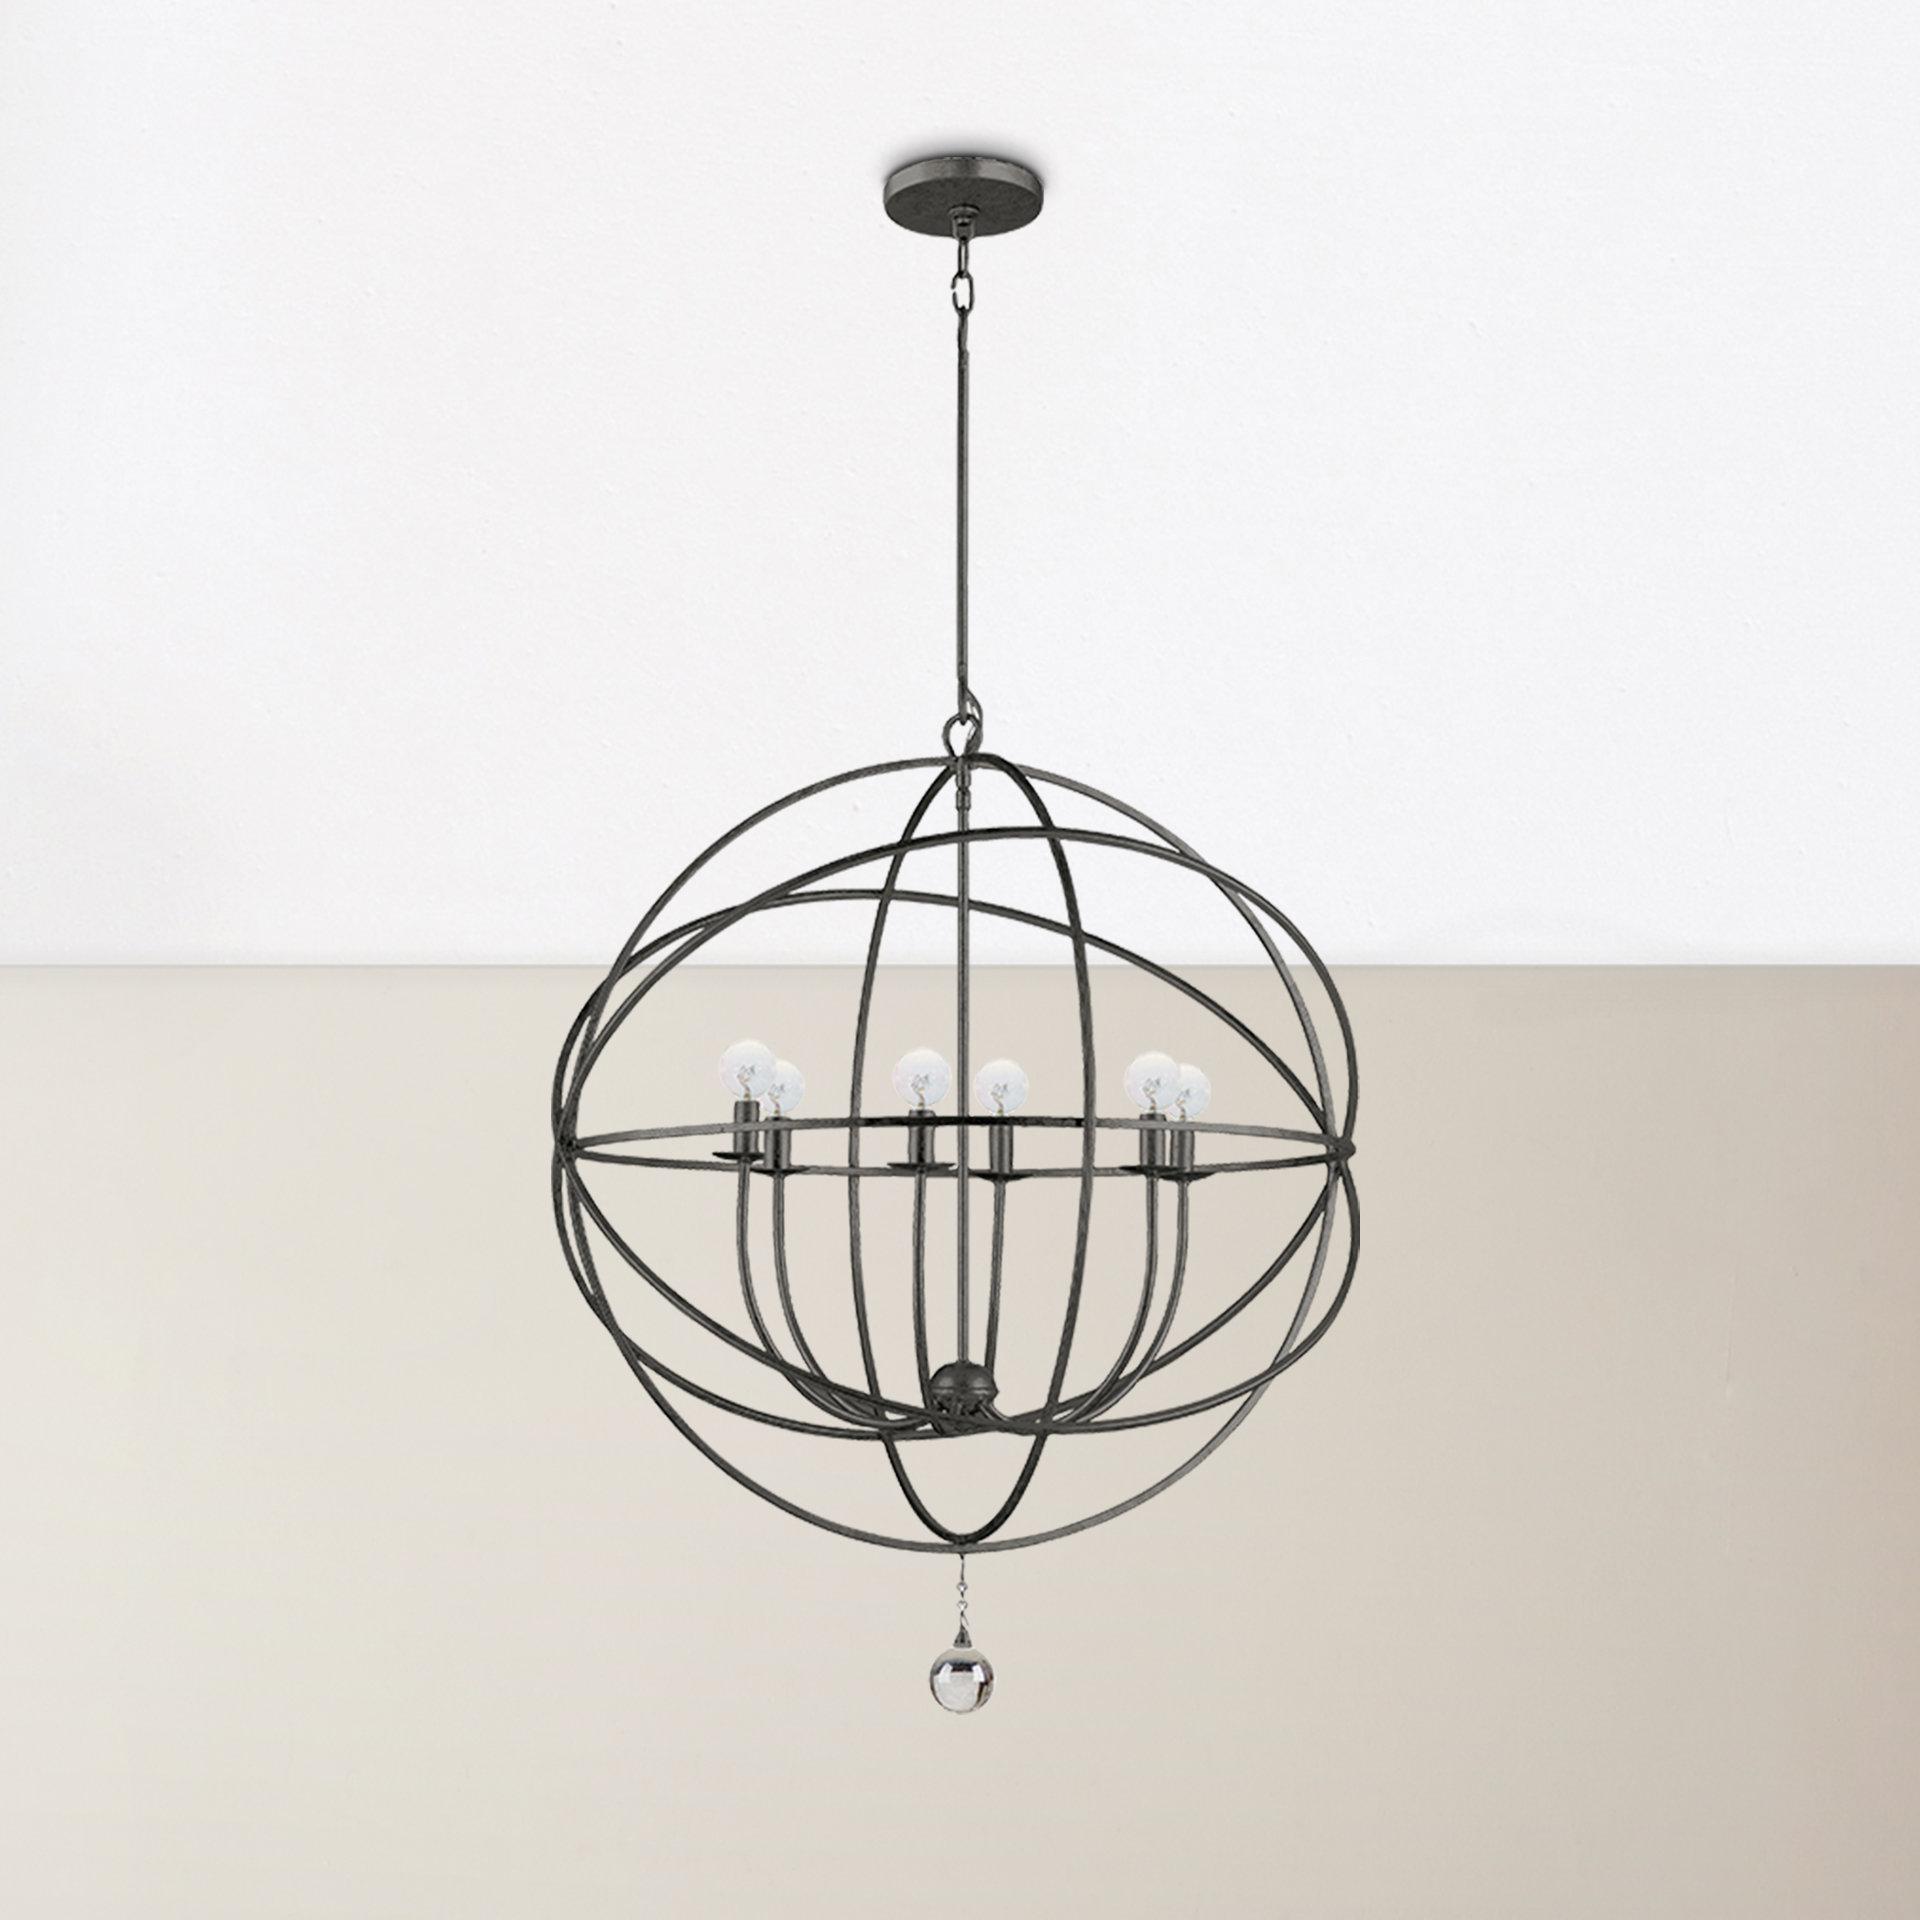 Current Gregoire 6 Light Globe Chandeliers Pertaining To Willa Arlo Interiors Gregoire 6 Light Globe Chandelier (View 22 of 25)